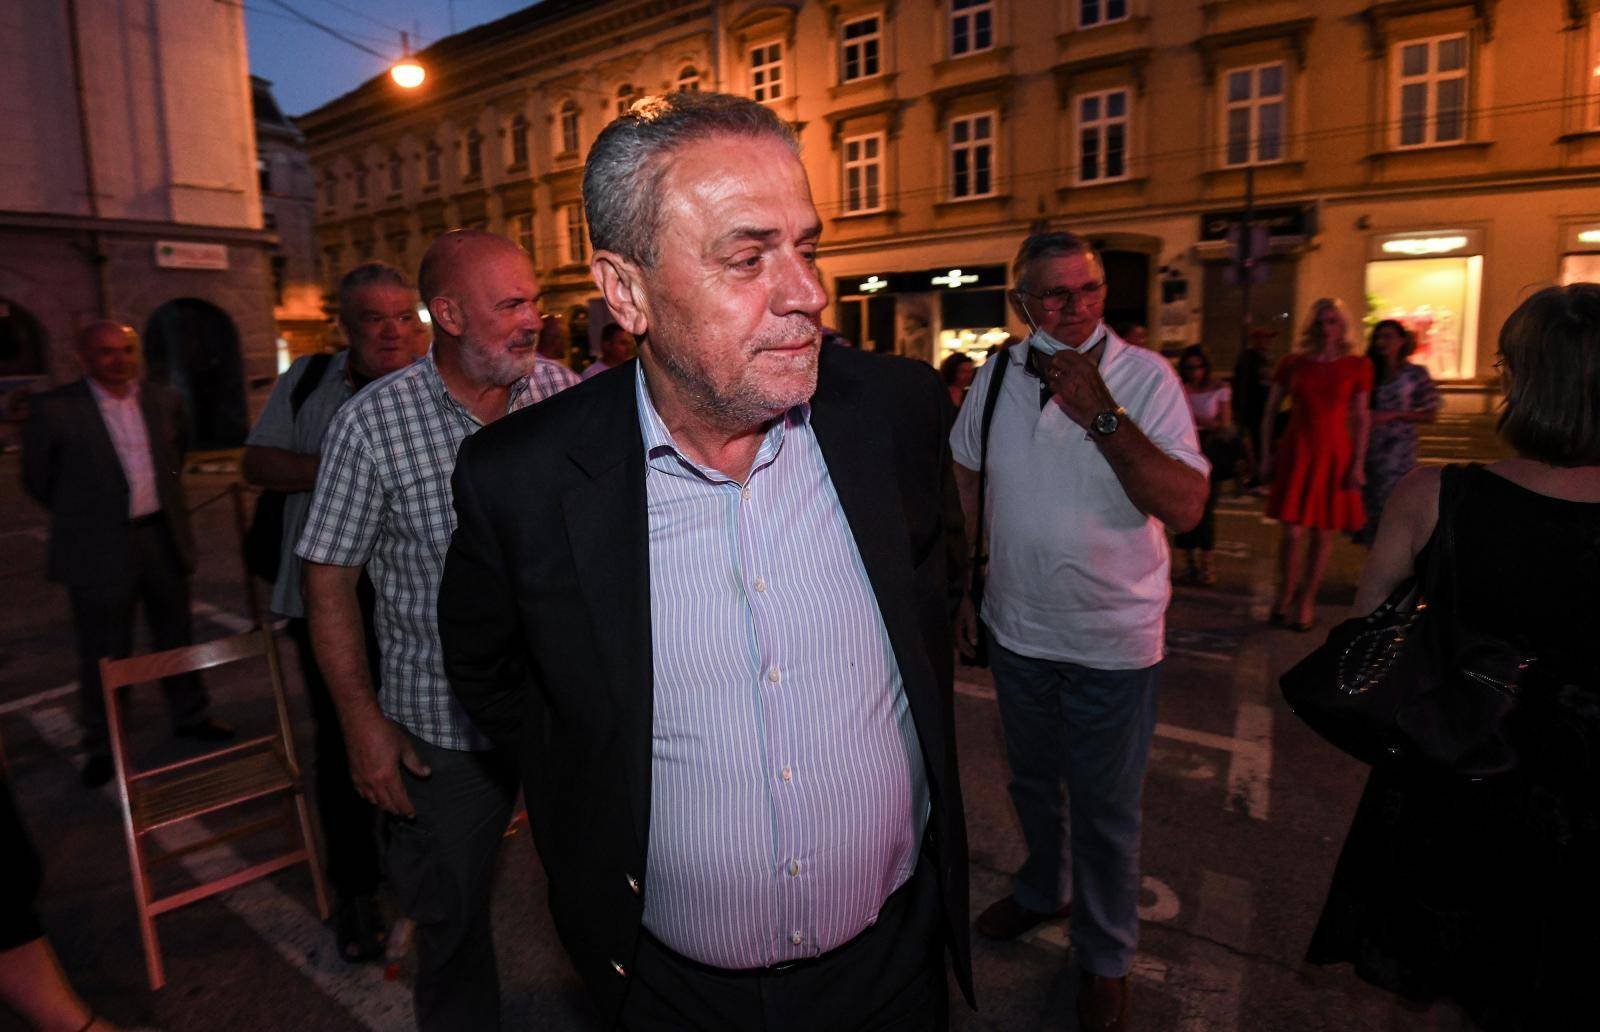 Zagreb: Doček izbornih rezultata u Stranci rada i solidarnosti